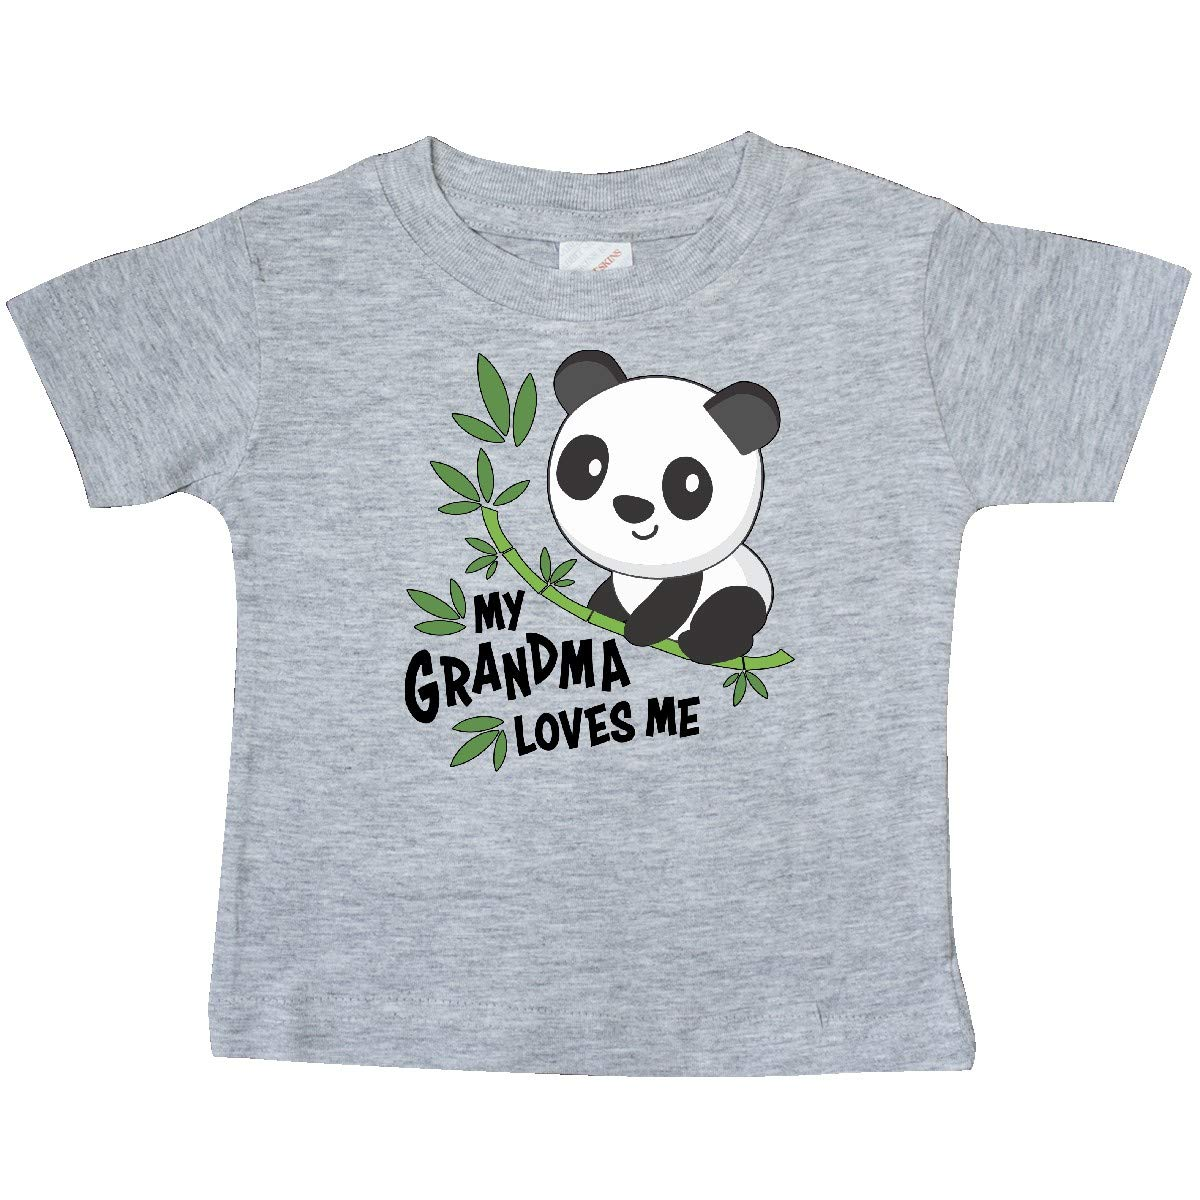 Cute Panda Baby T-Shirt inktastic My Grandma Loves Me